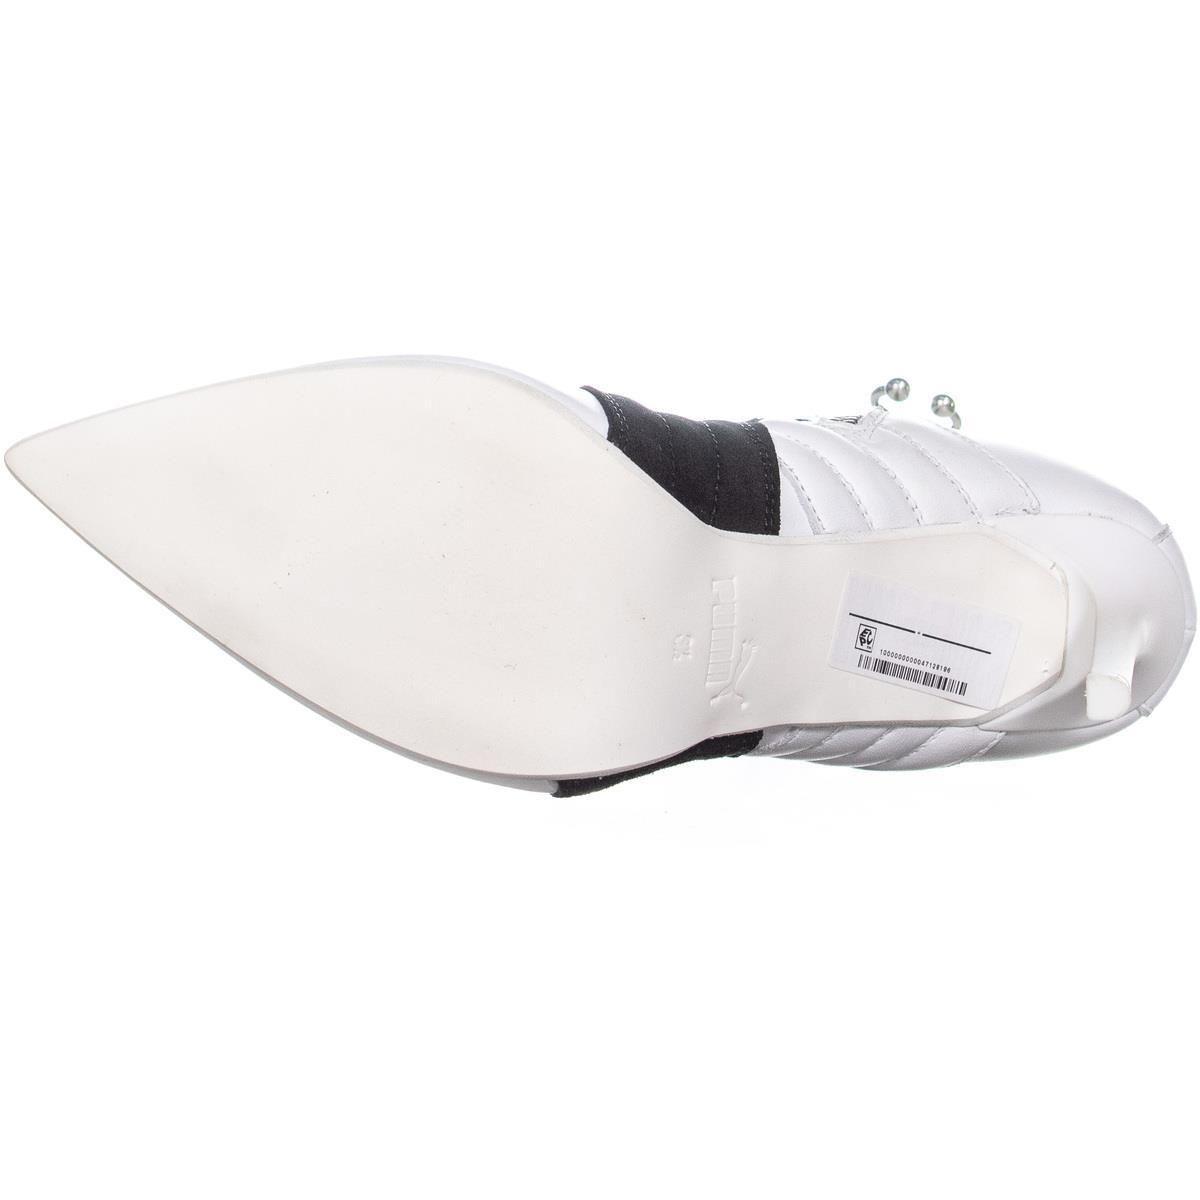 007f2f03ef6 PUMA - White Fenty High Heel Sneaker Ankle Boots - Lyst. View fullscreen